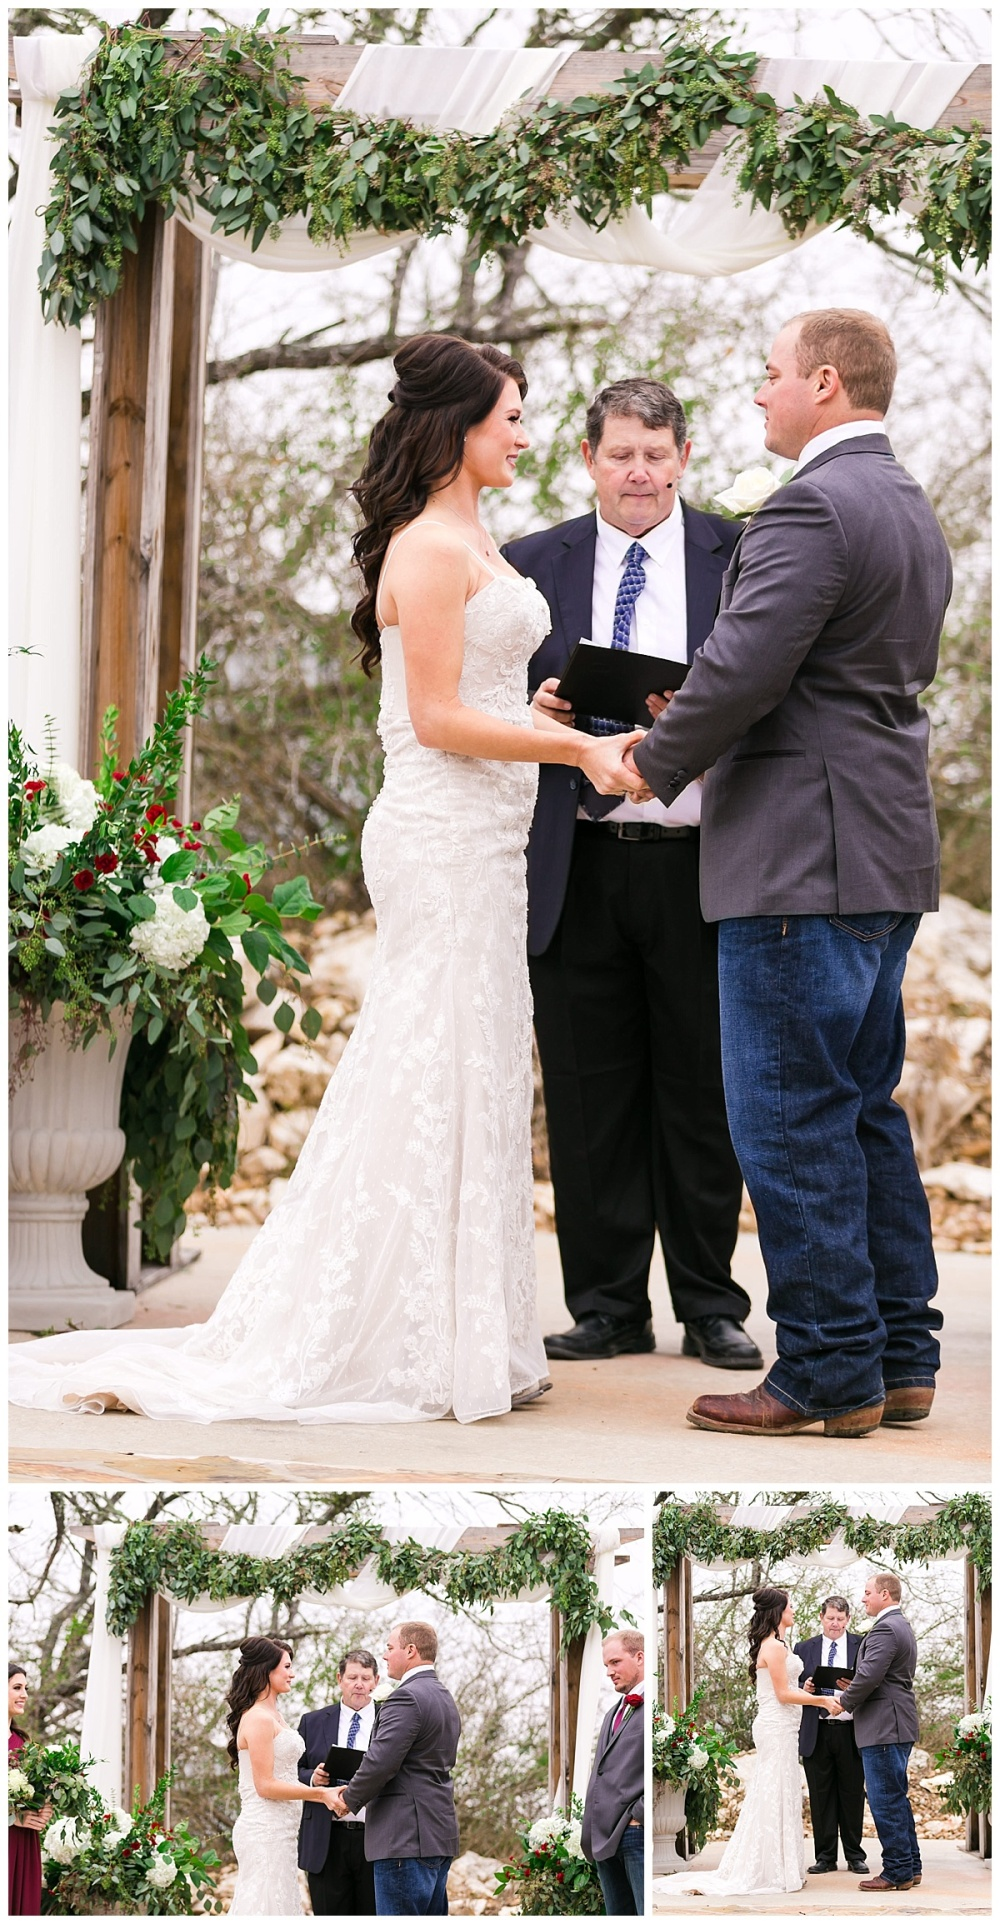 Carly-Barton-Photography-Geronimo-Oaks-Wedding-Venue-Texas-Hill-Country-Ronnie-Sarah_0099.jpg